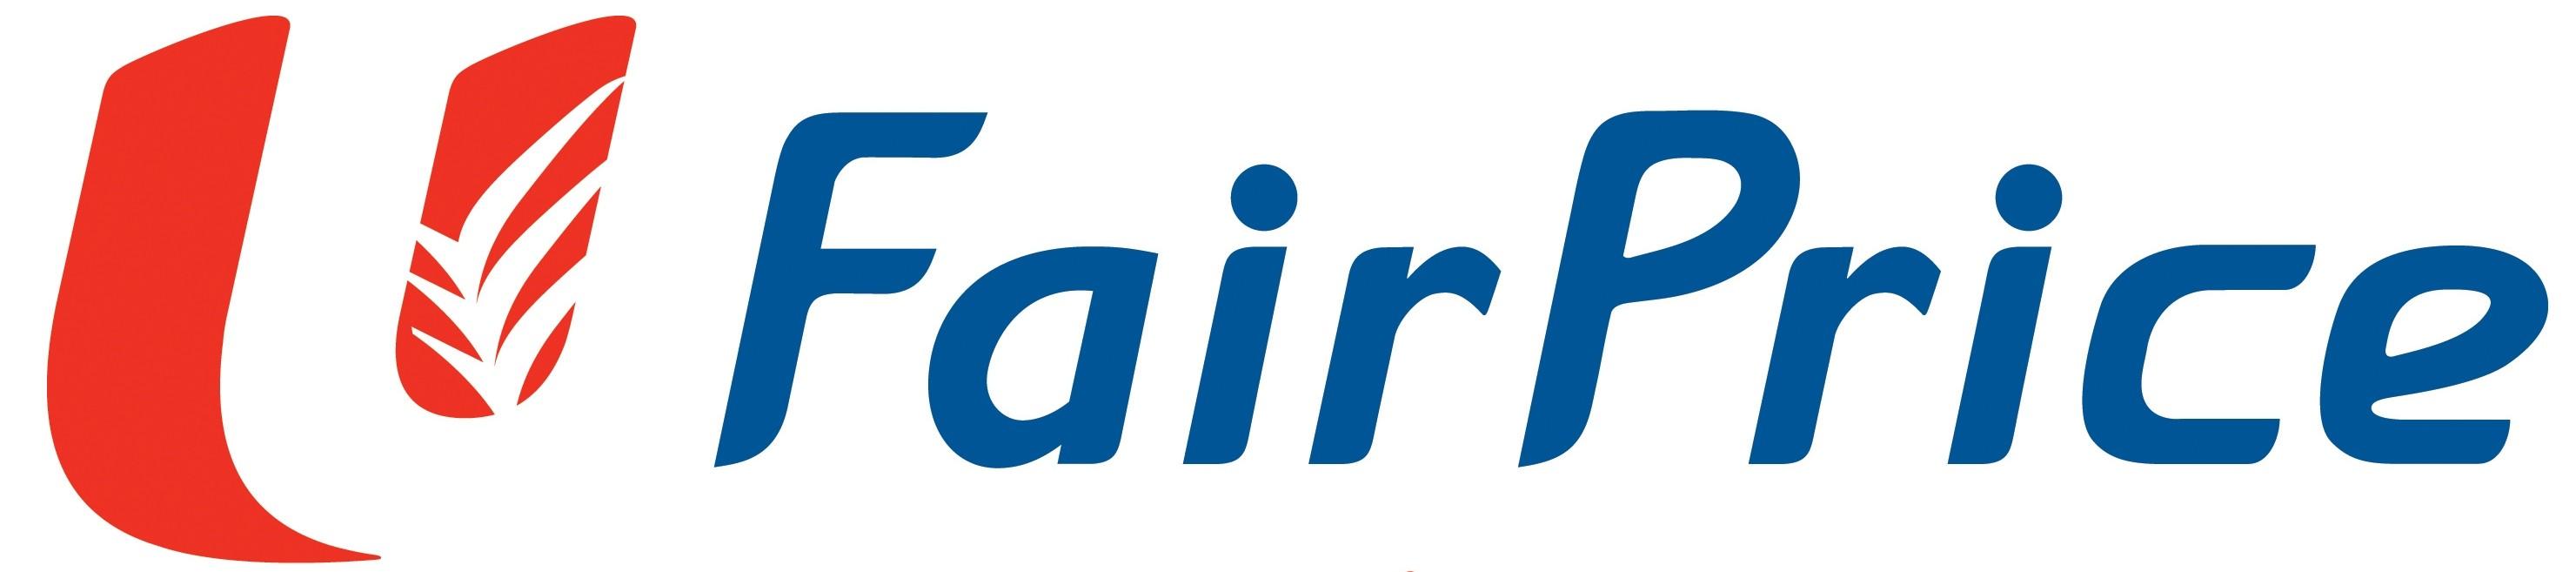 Fairprice Logo PNG - 29275